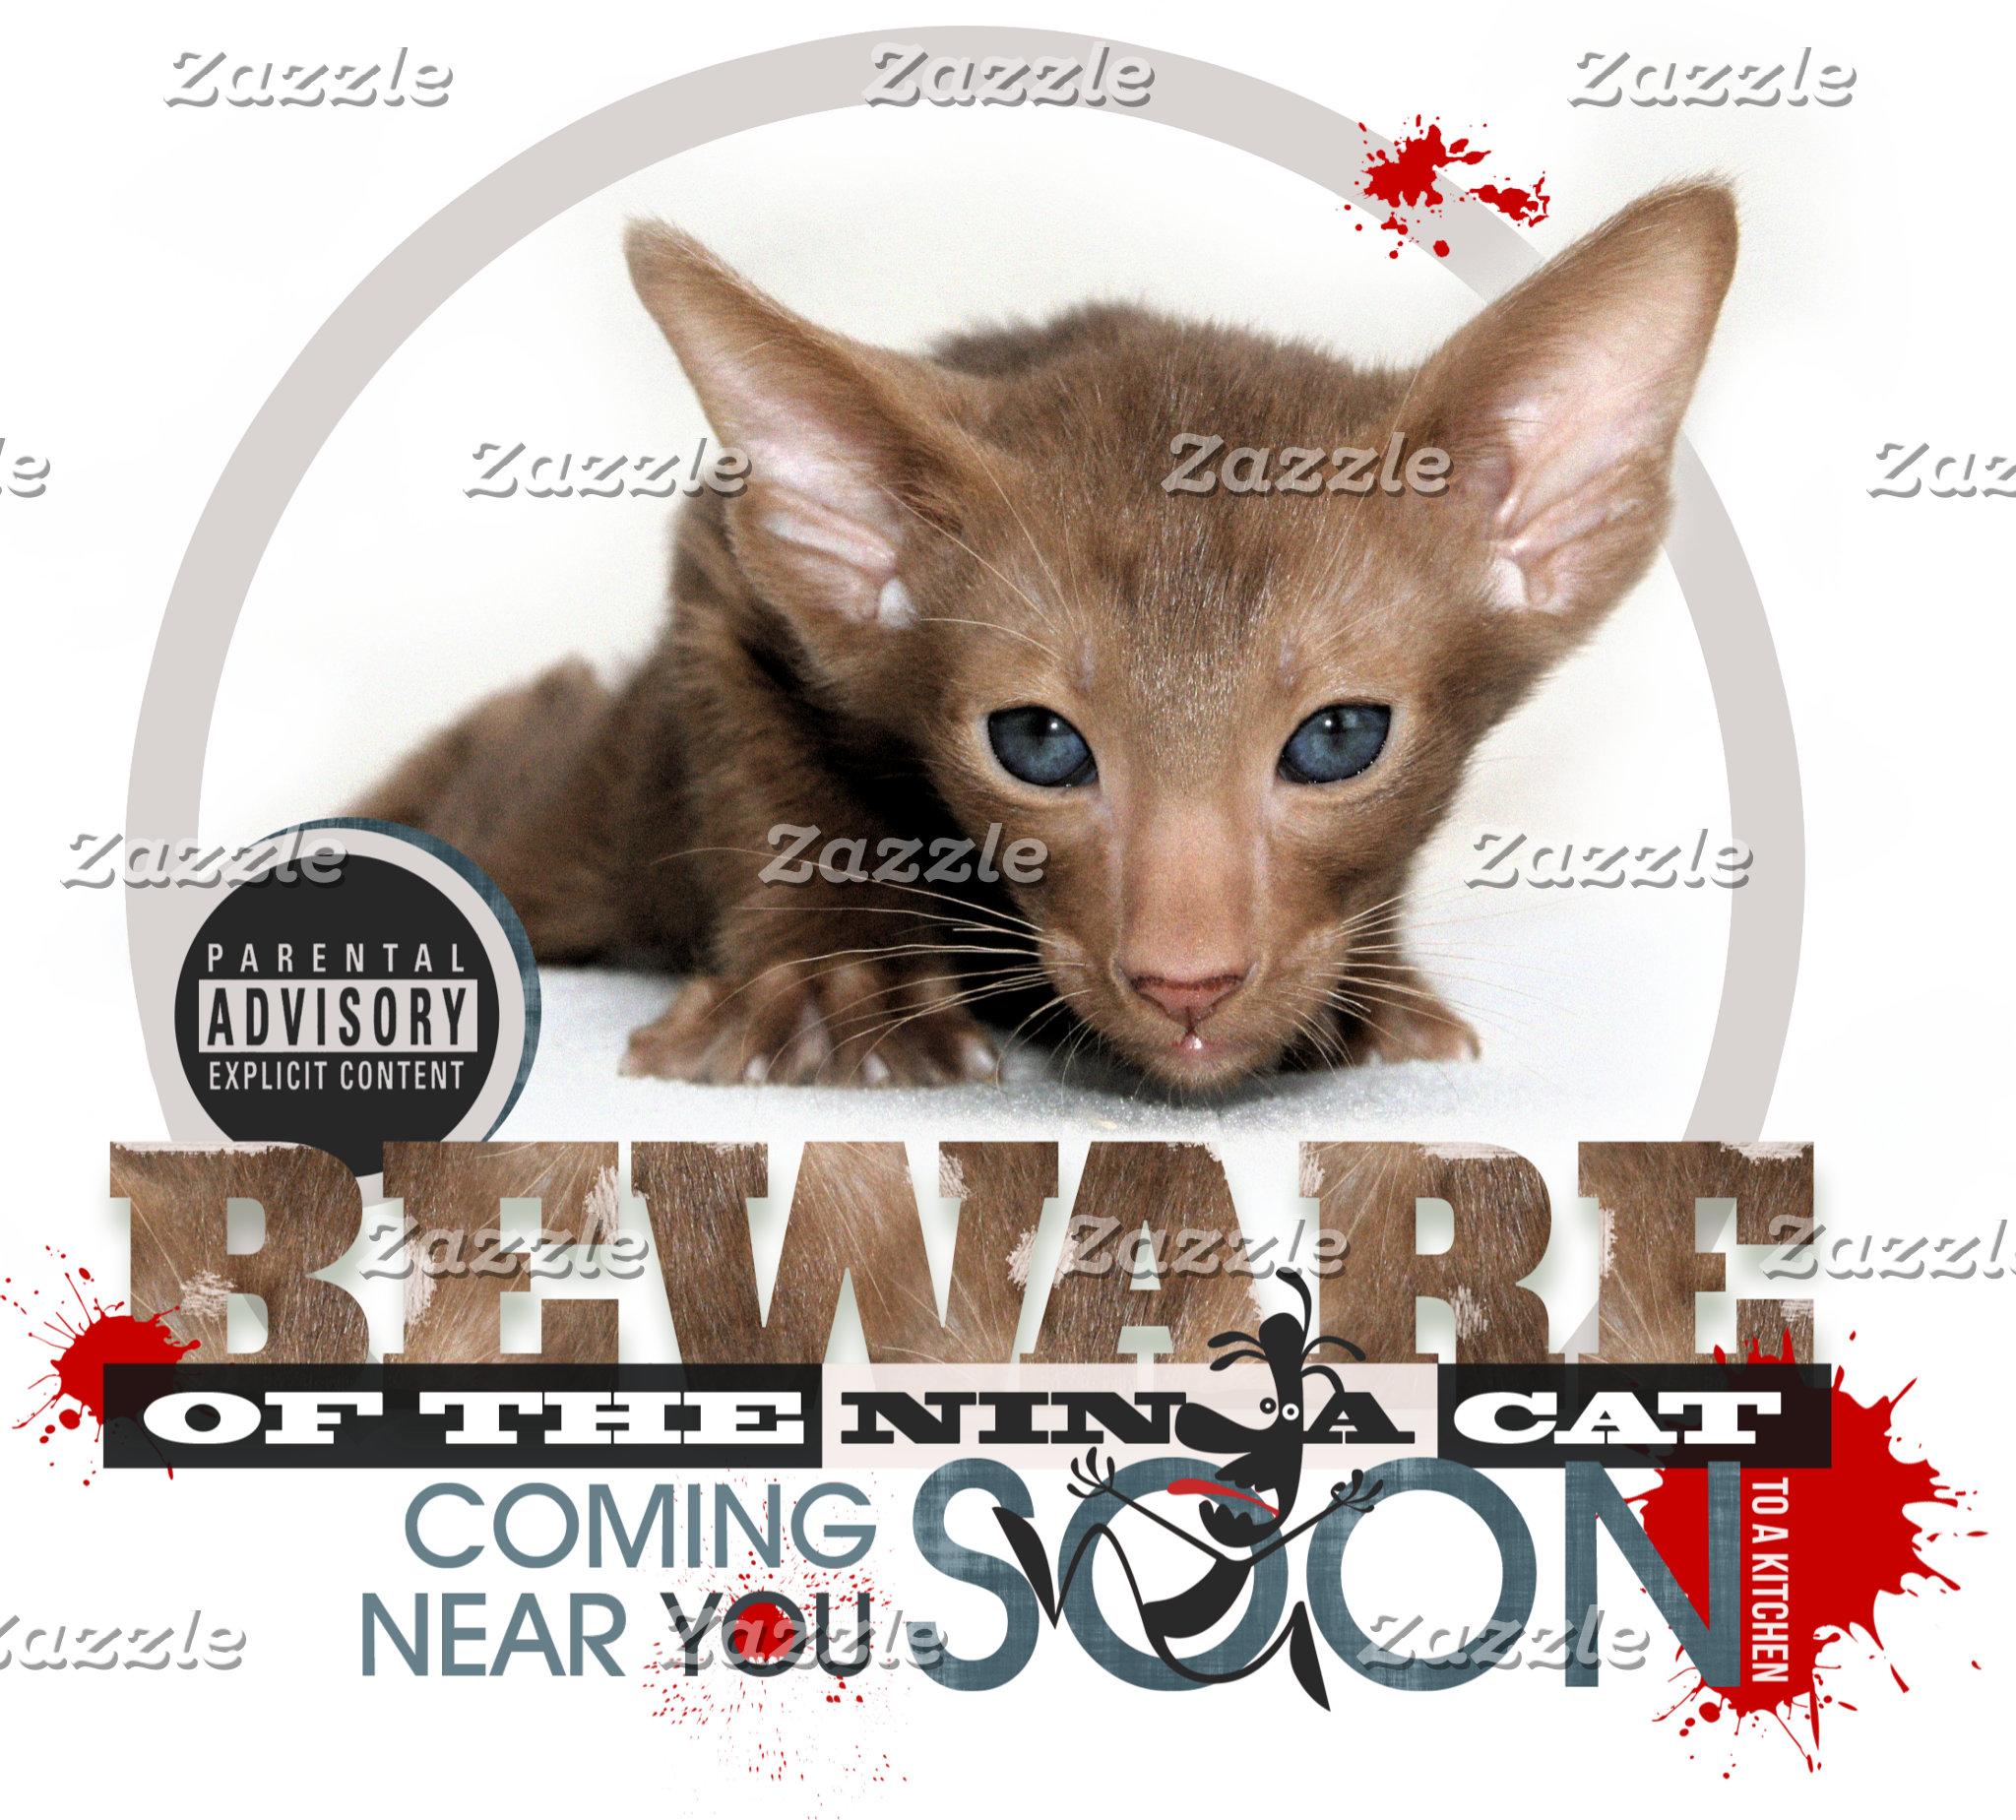 Beware of the Ninja Cat